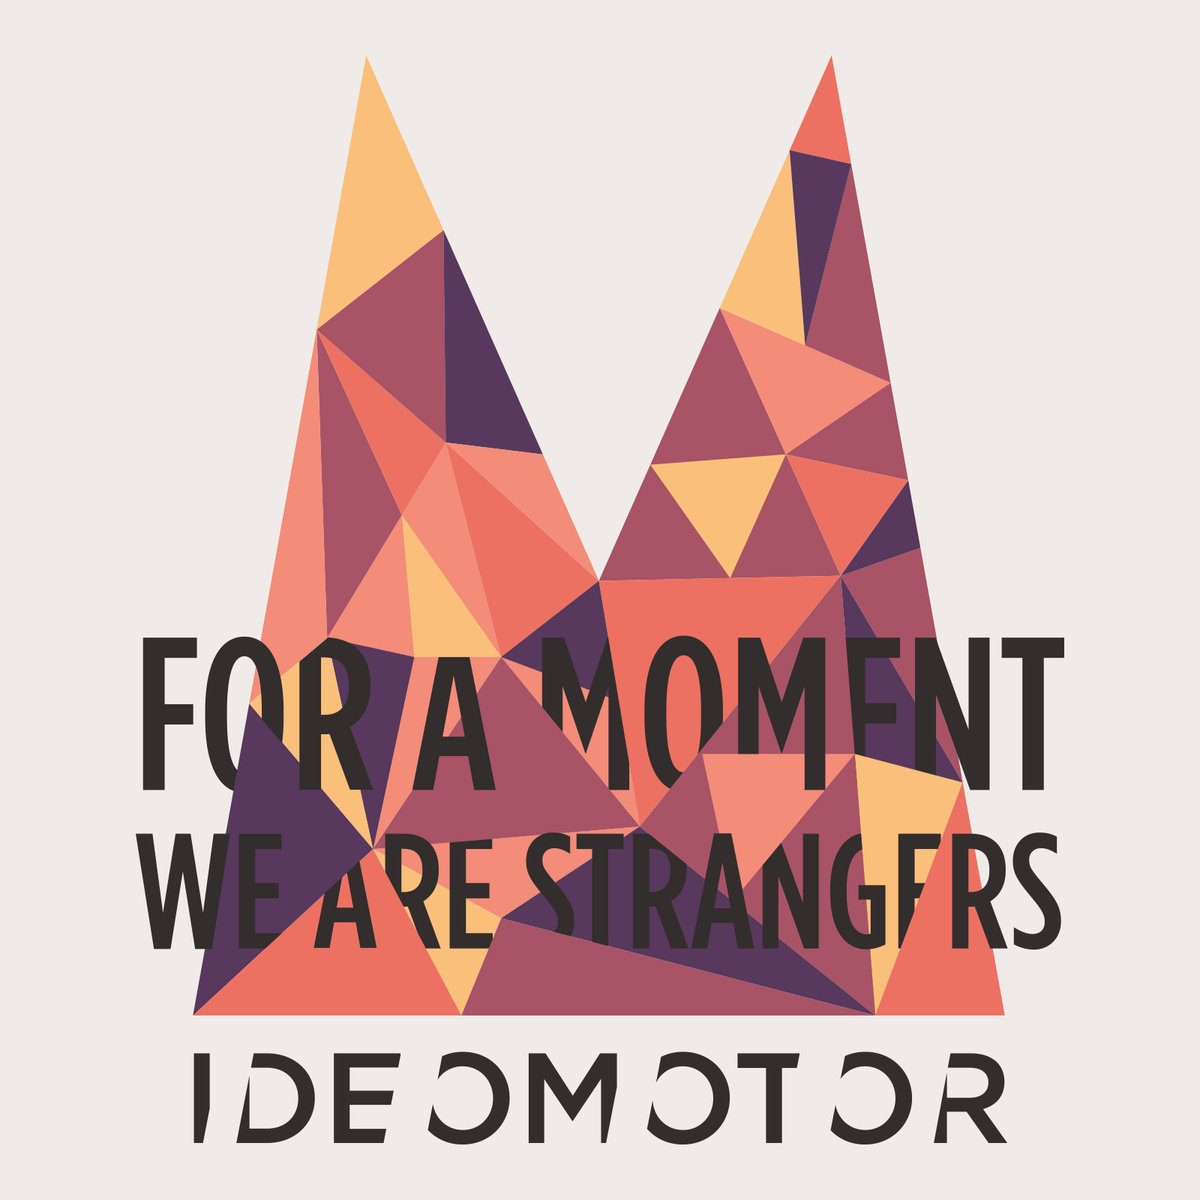 Ideomotor – The Gutter